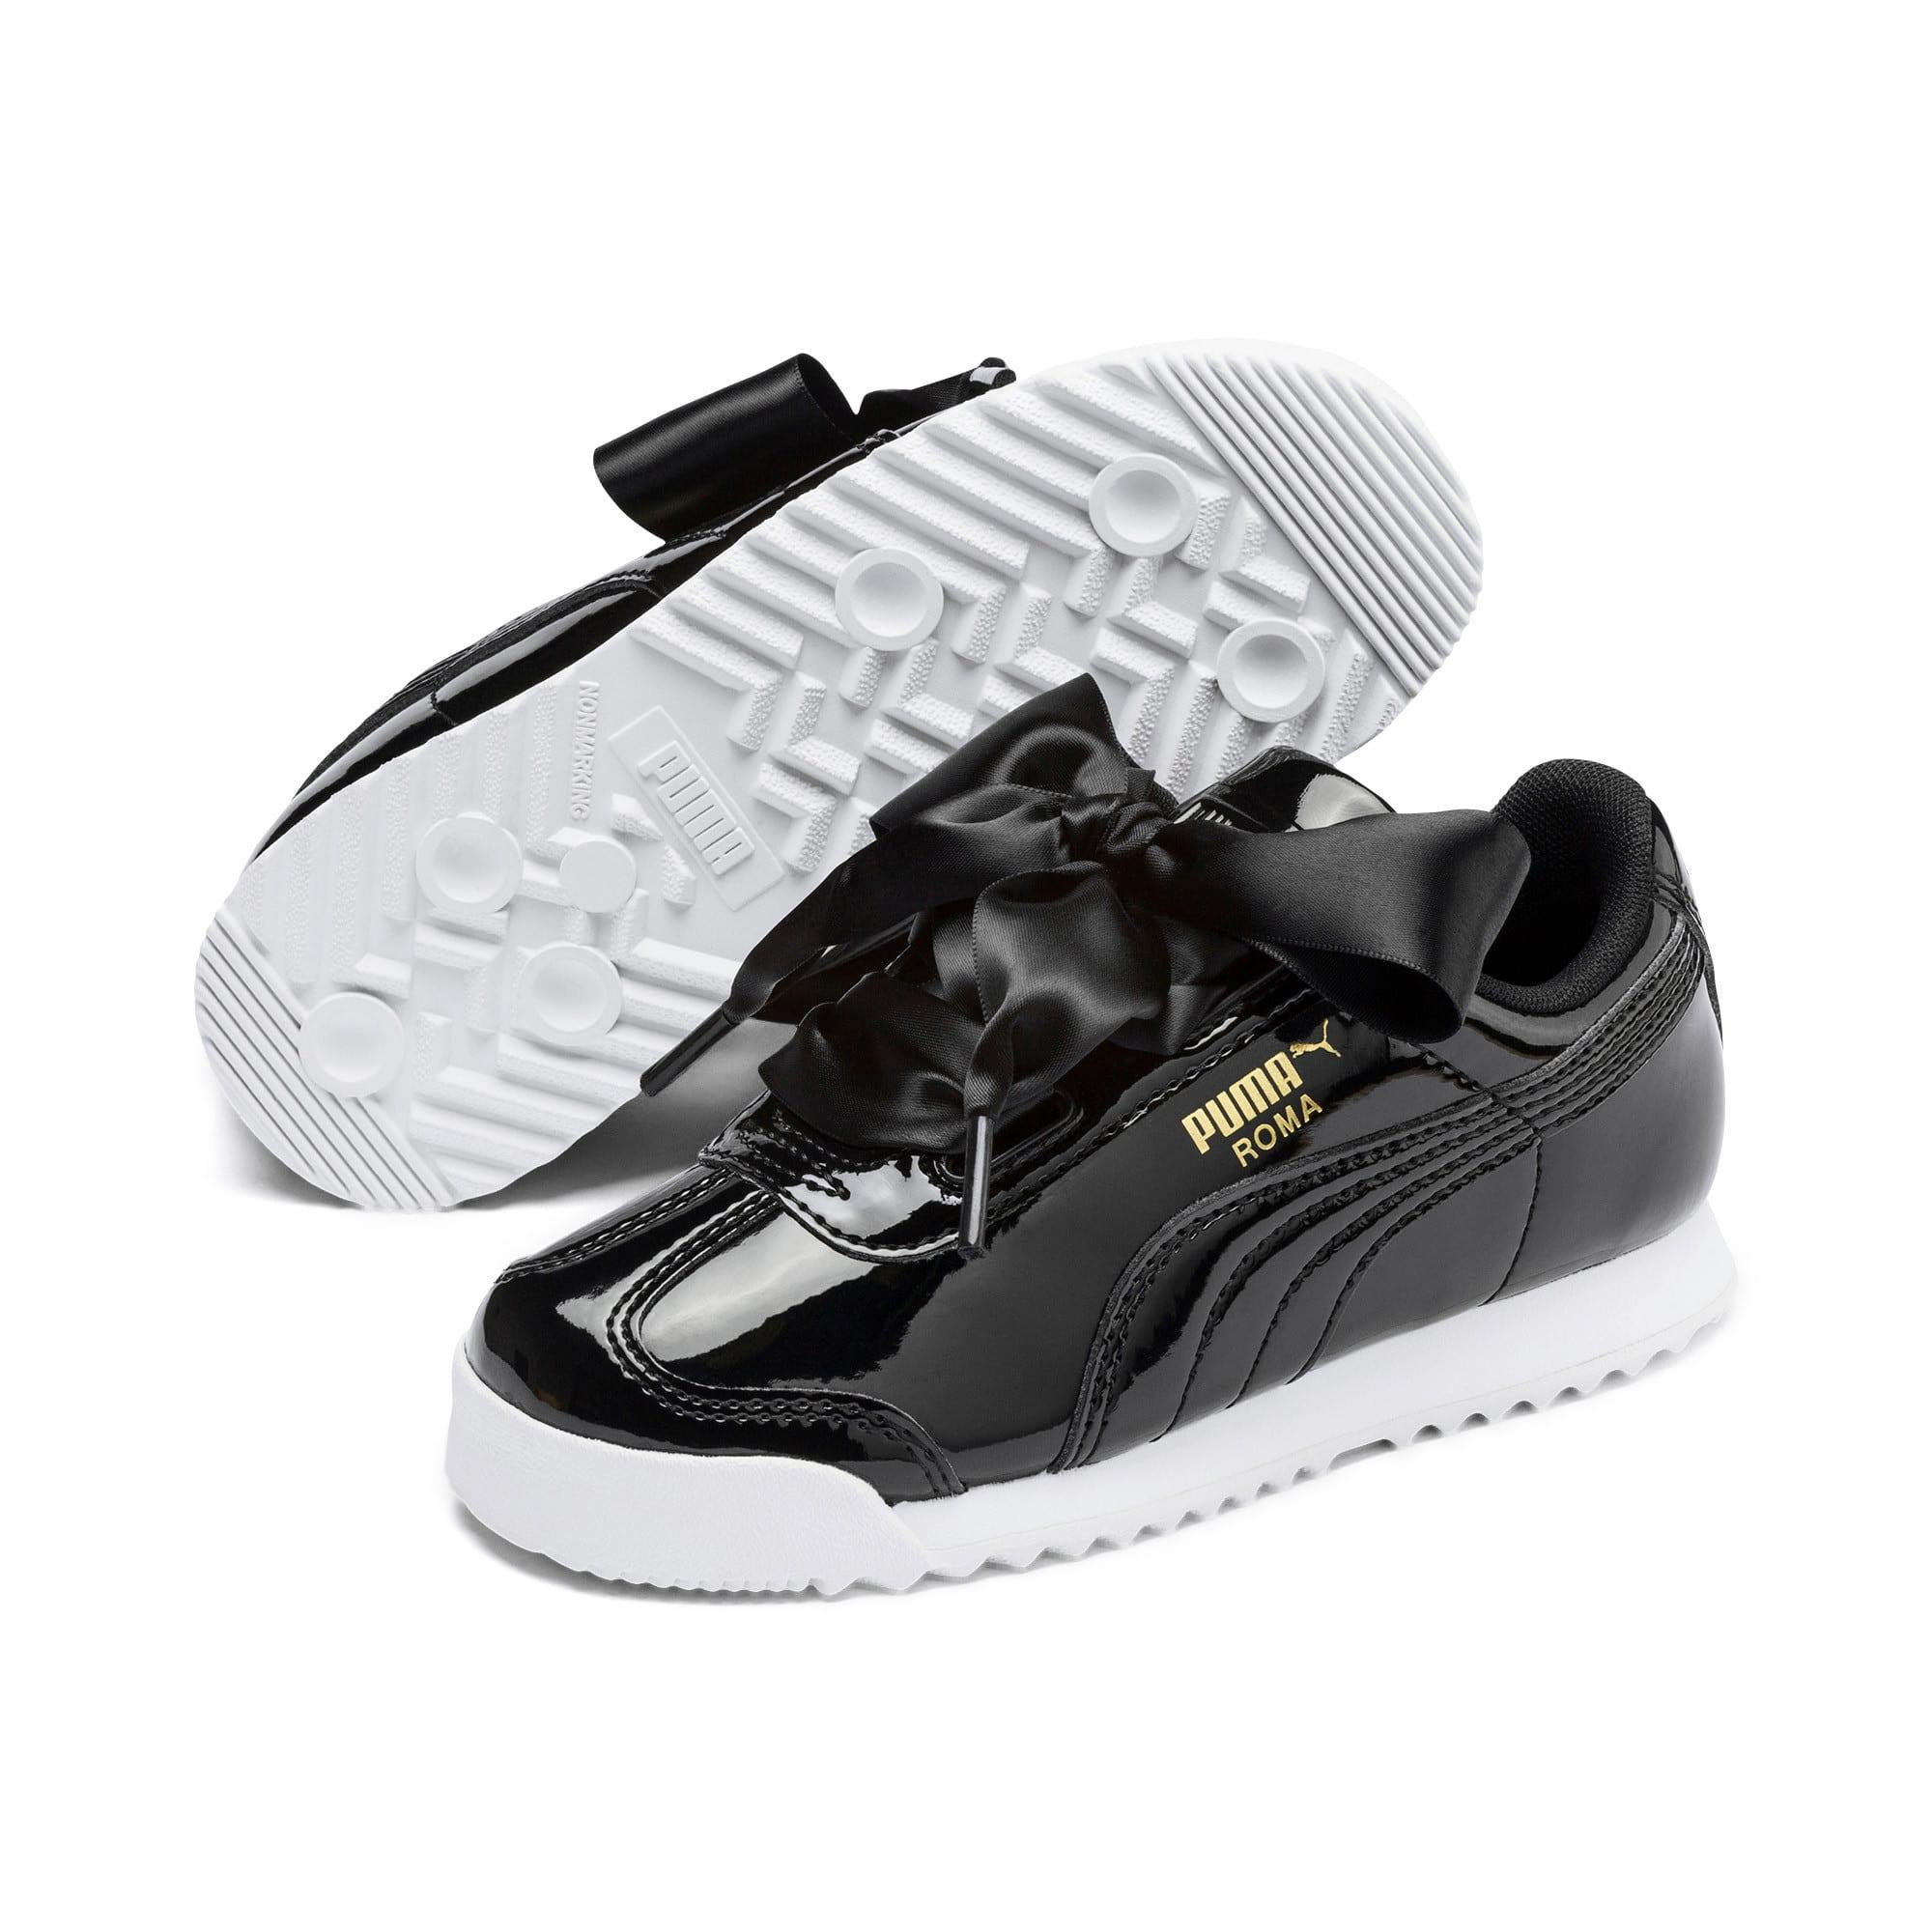 Thumbnail 2 of Roma Heart Patent Kids Sneaker, Puma Black, medium